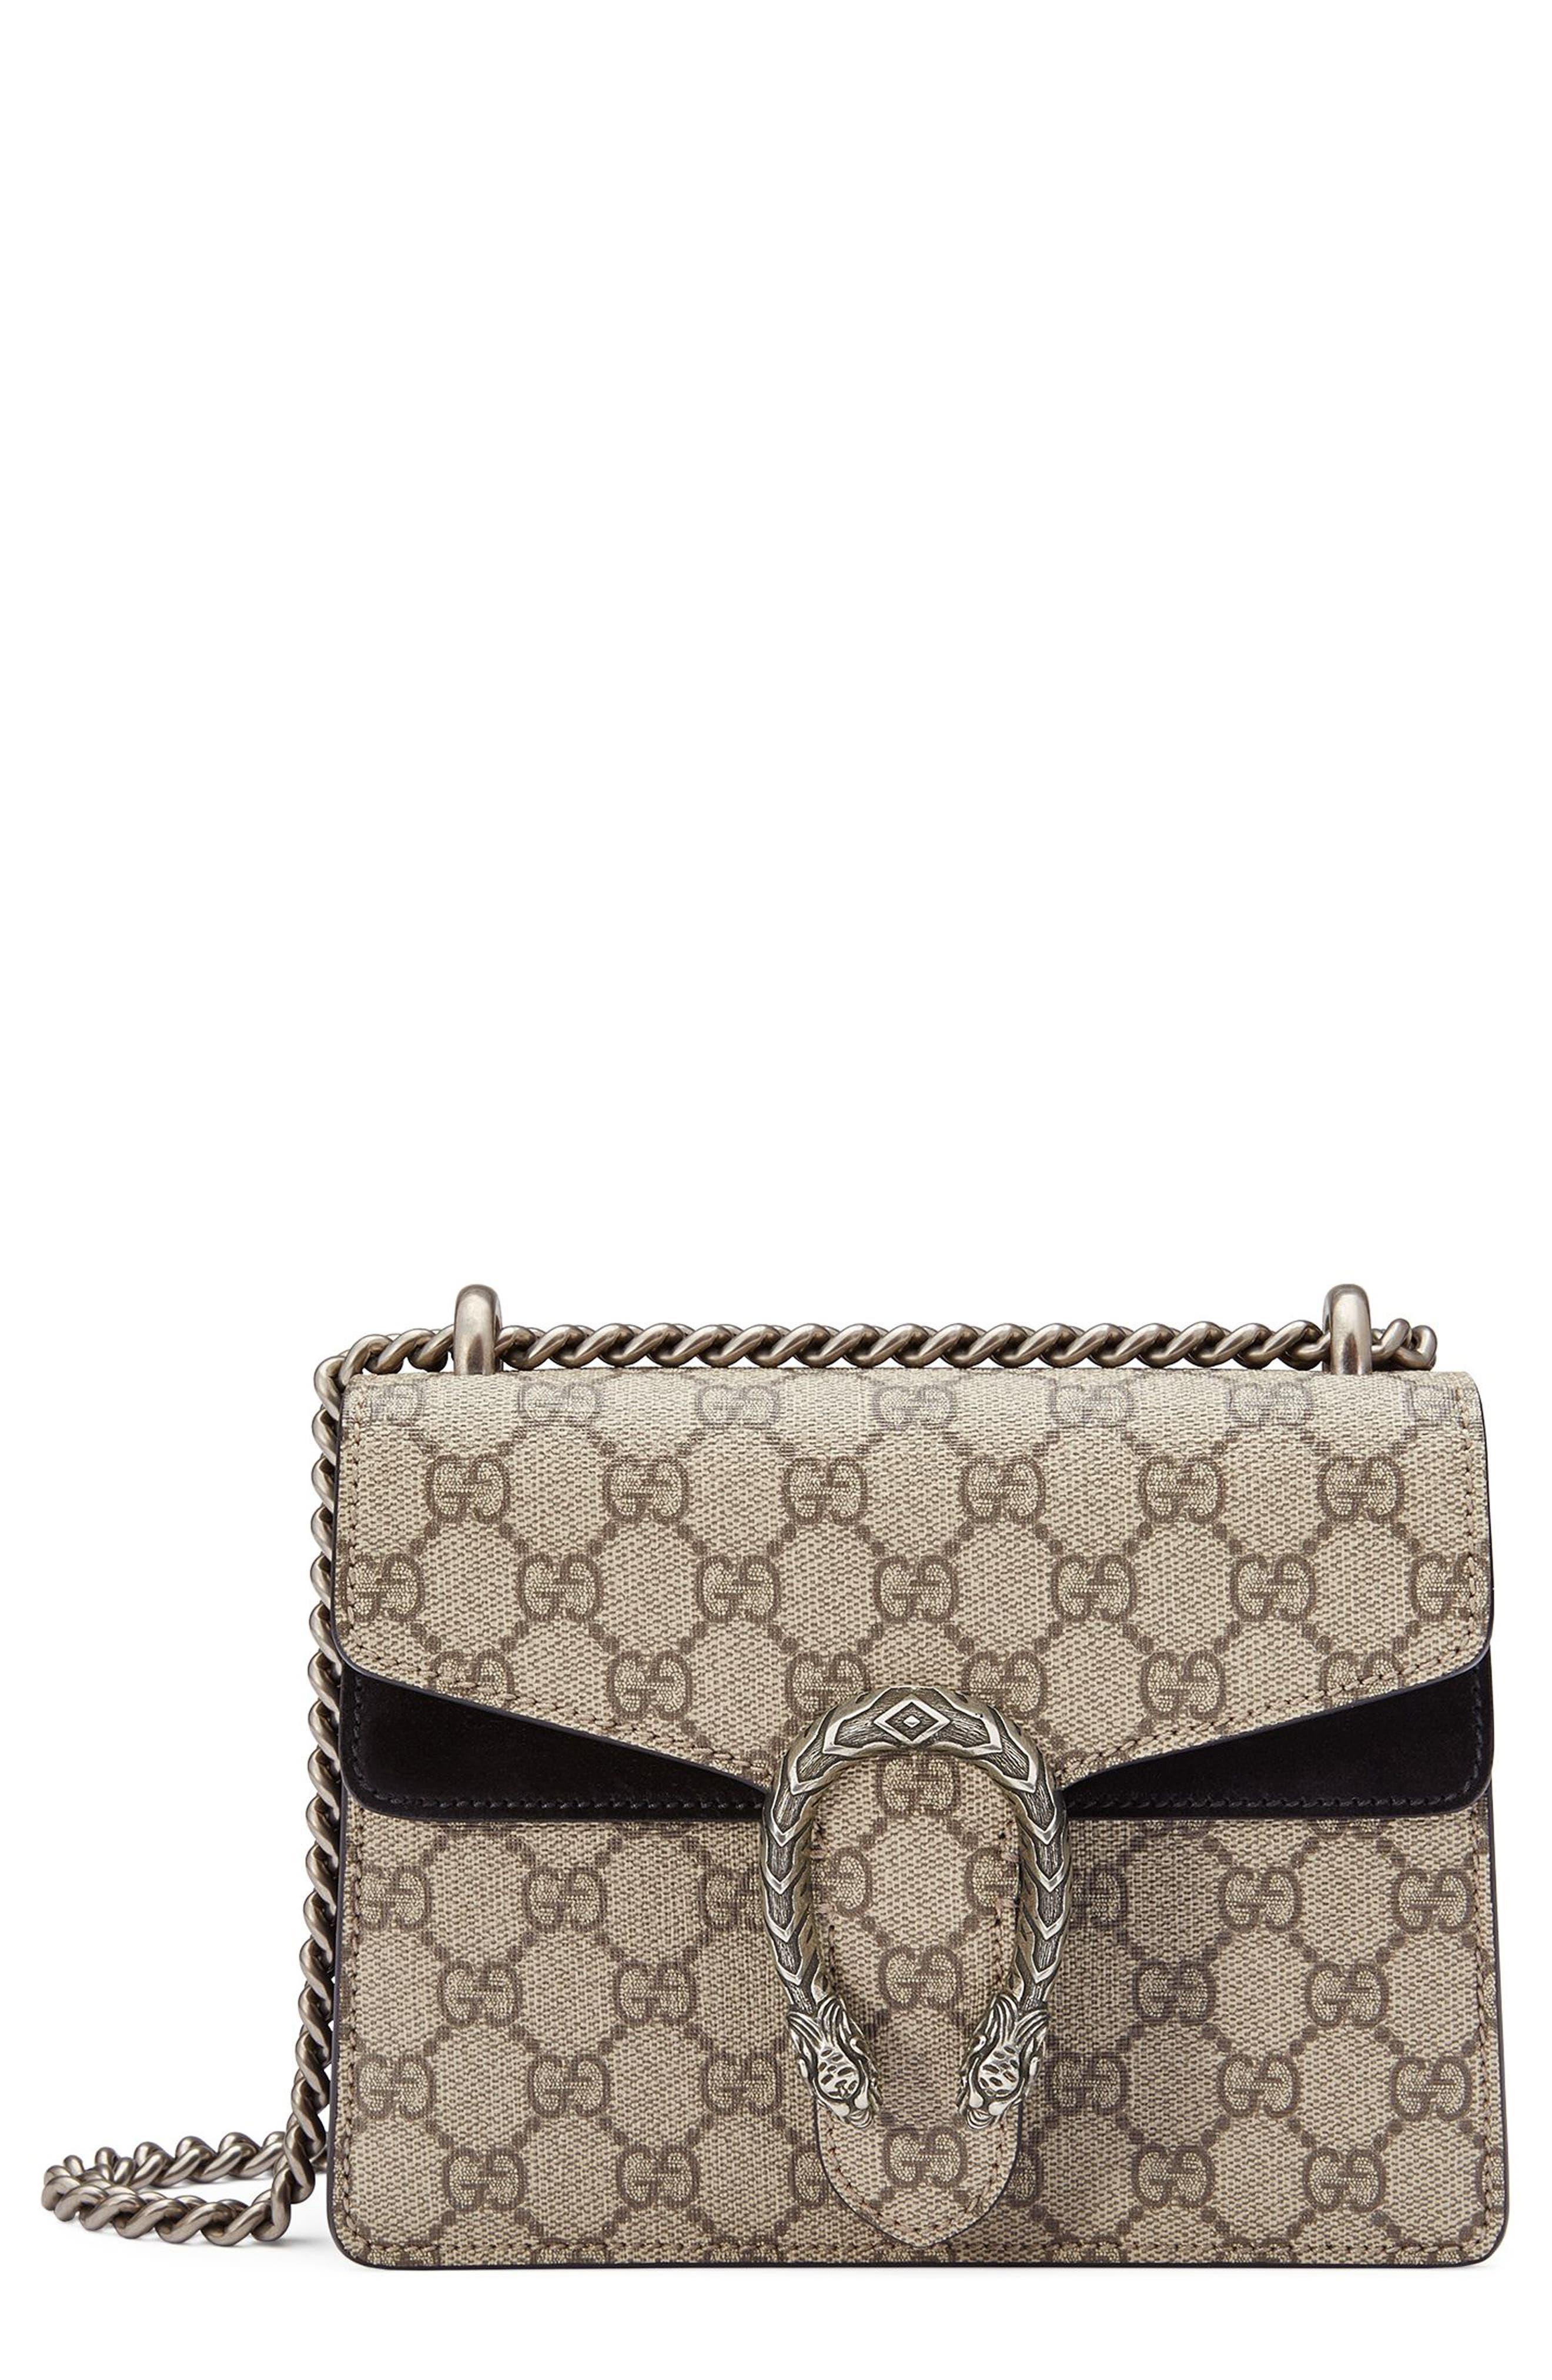 ,                             Mini Dionysus GG Supreme Shoulder Bag,                             Main thumbnail 1, color,                             BEIGE EBONY/ NERO